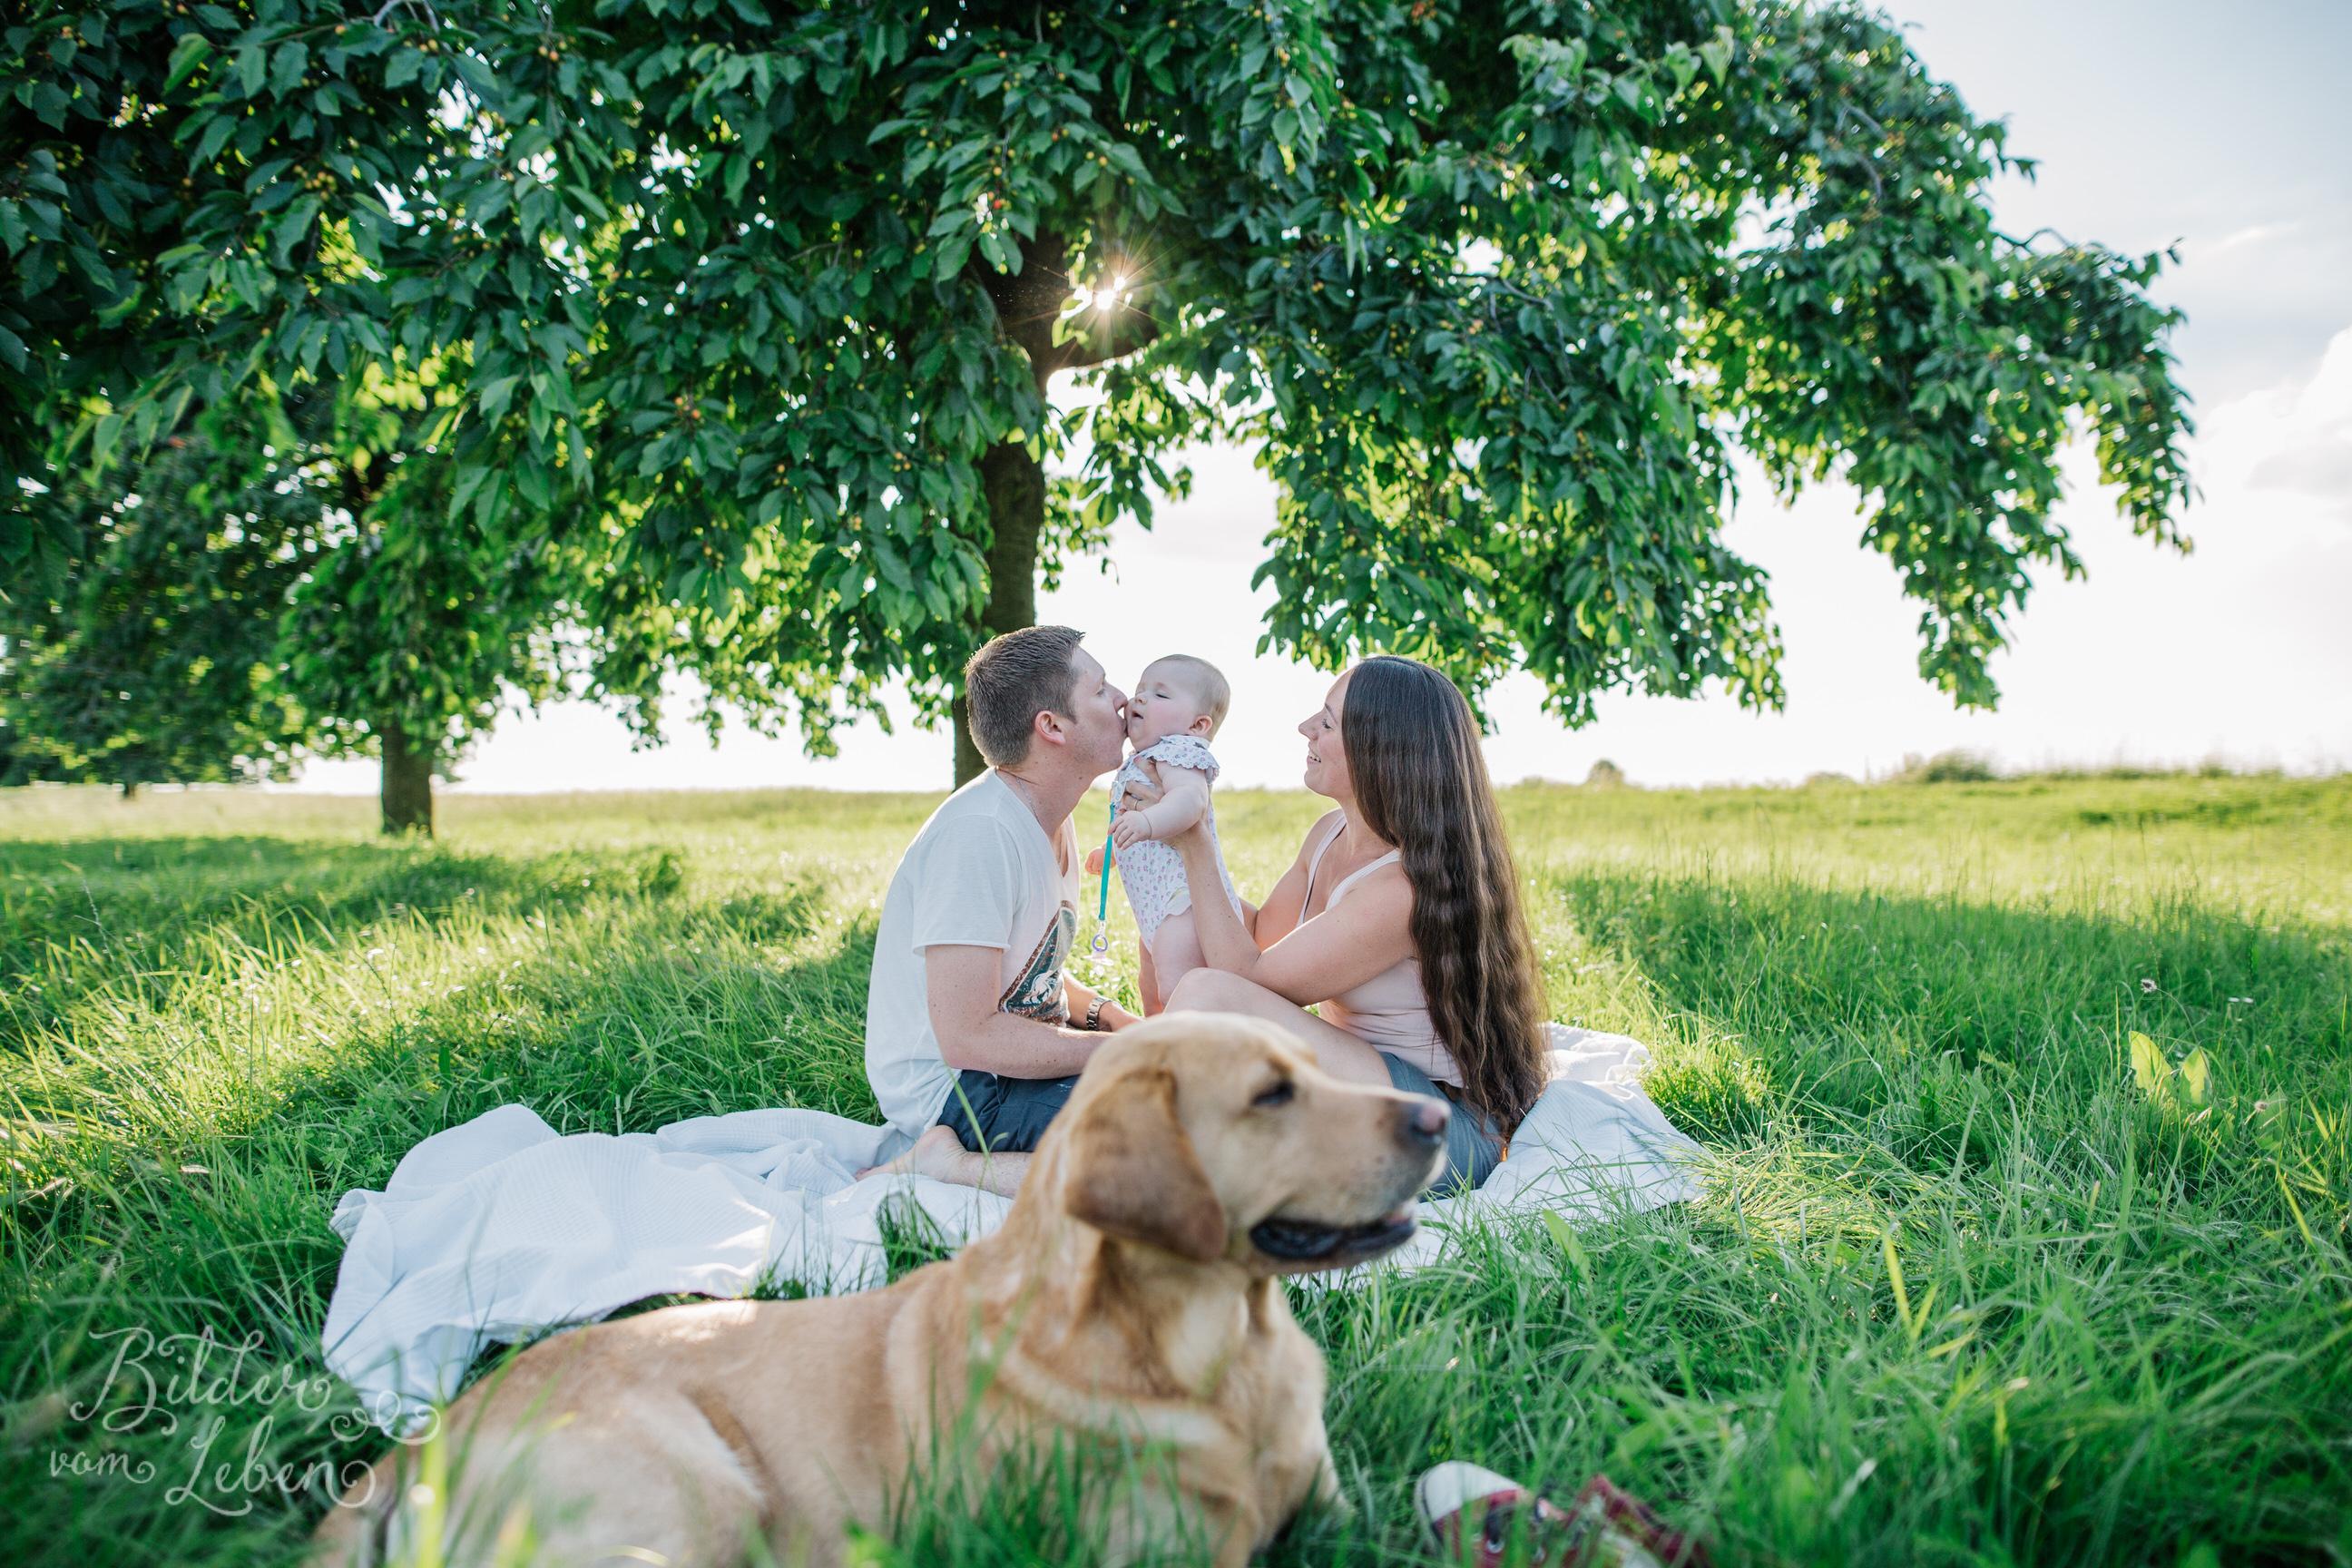 Greta-Labrador-Kinder-Portraits-BildervomLeben-2016-8111